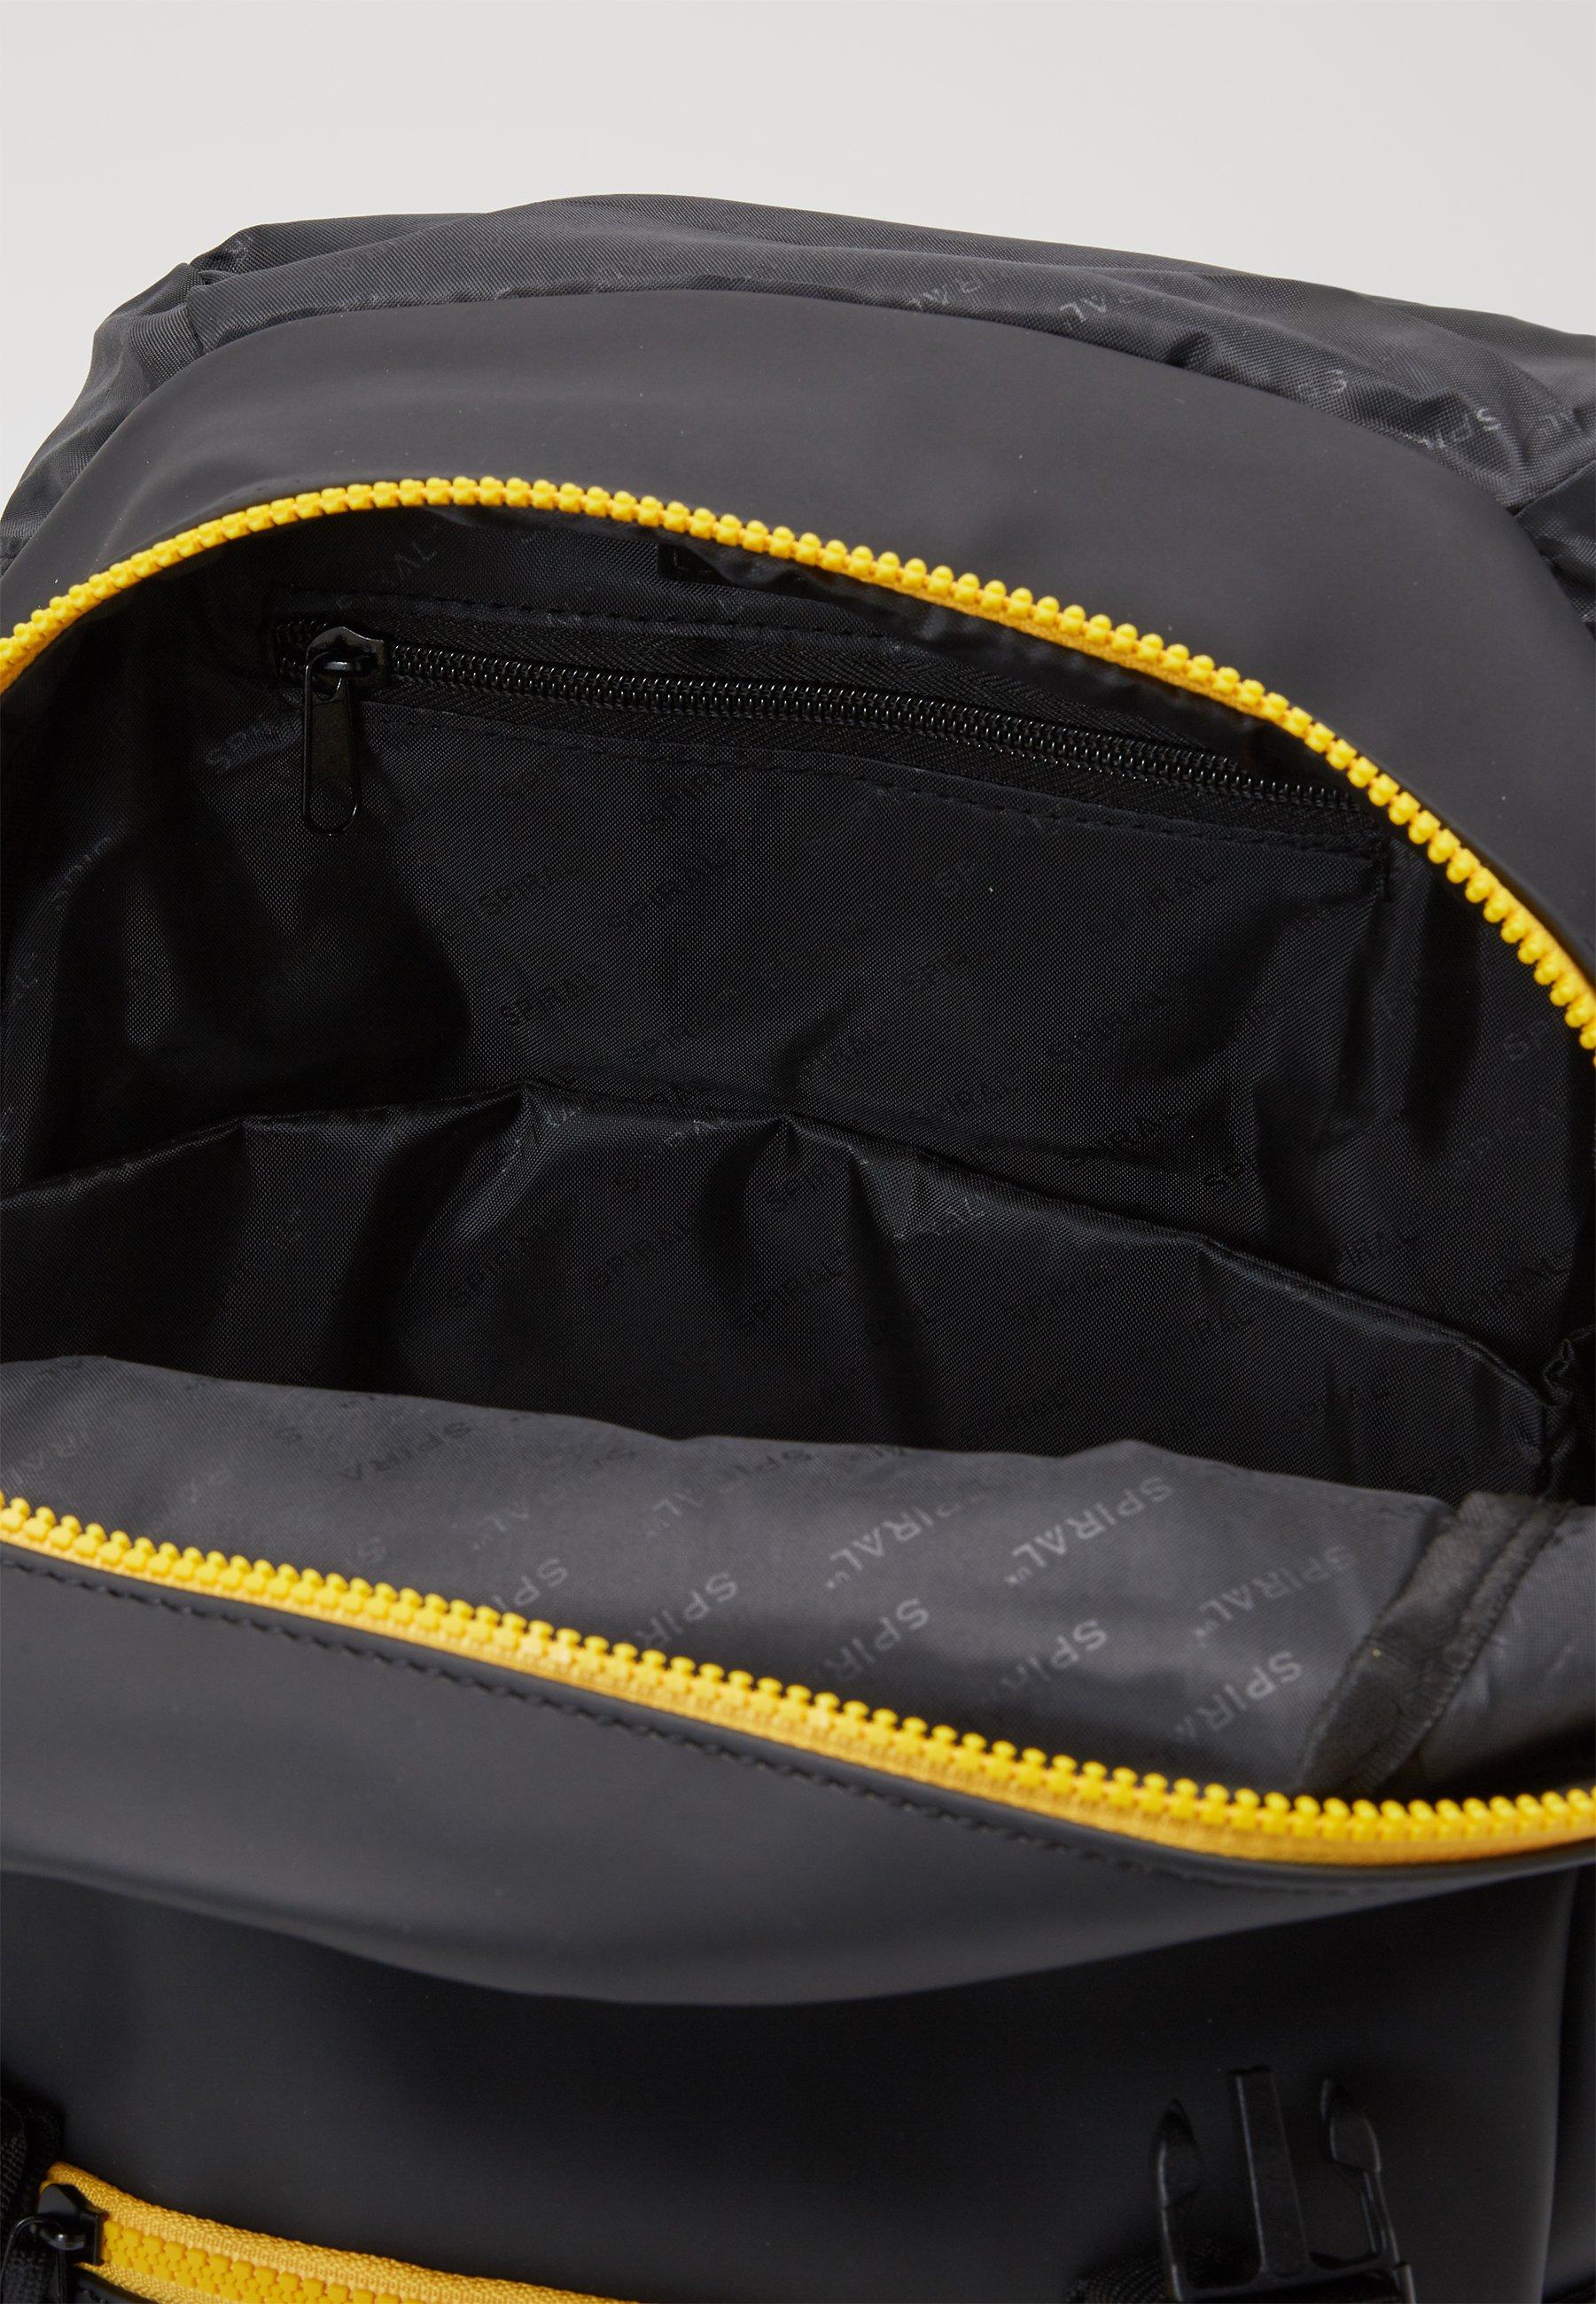 Spiral Bags CLIMATE - Tagesrucksack - black/schwarz - Herrentaschen xhjkd